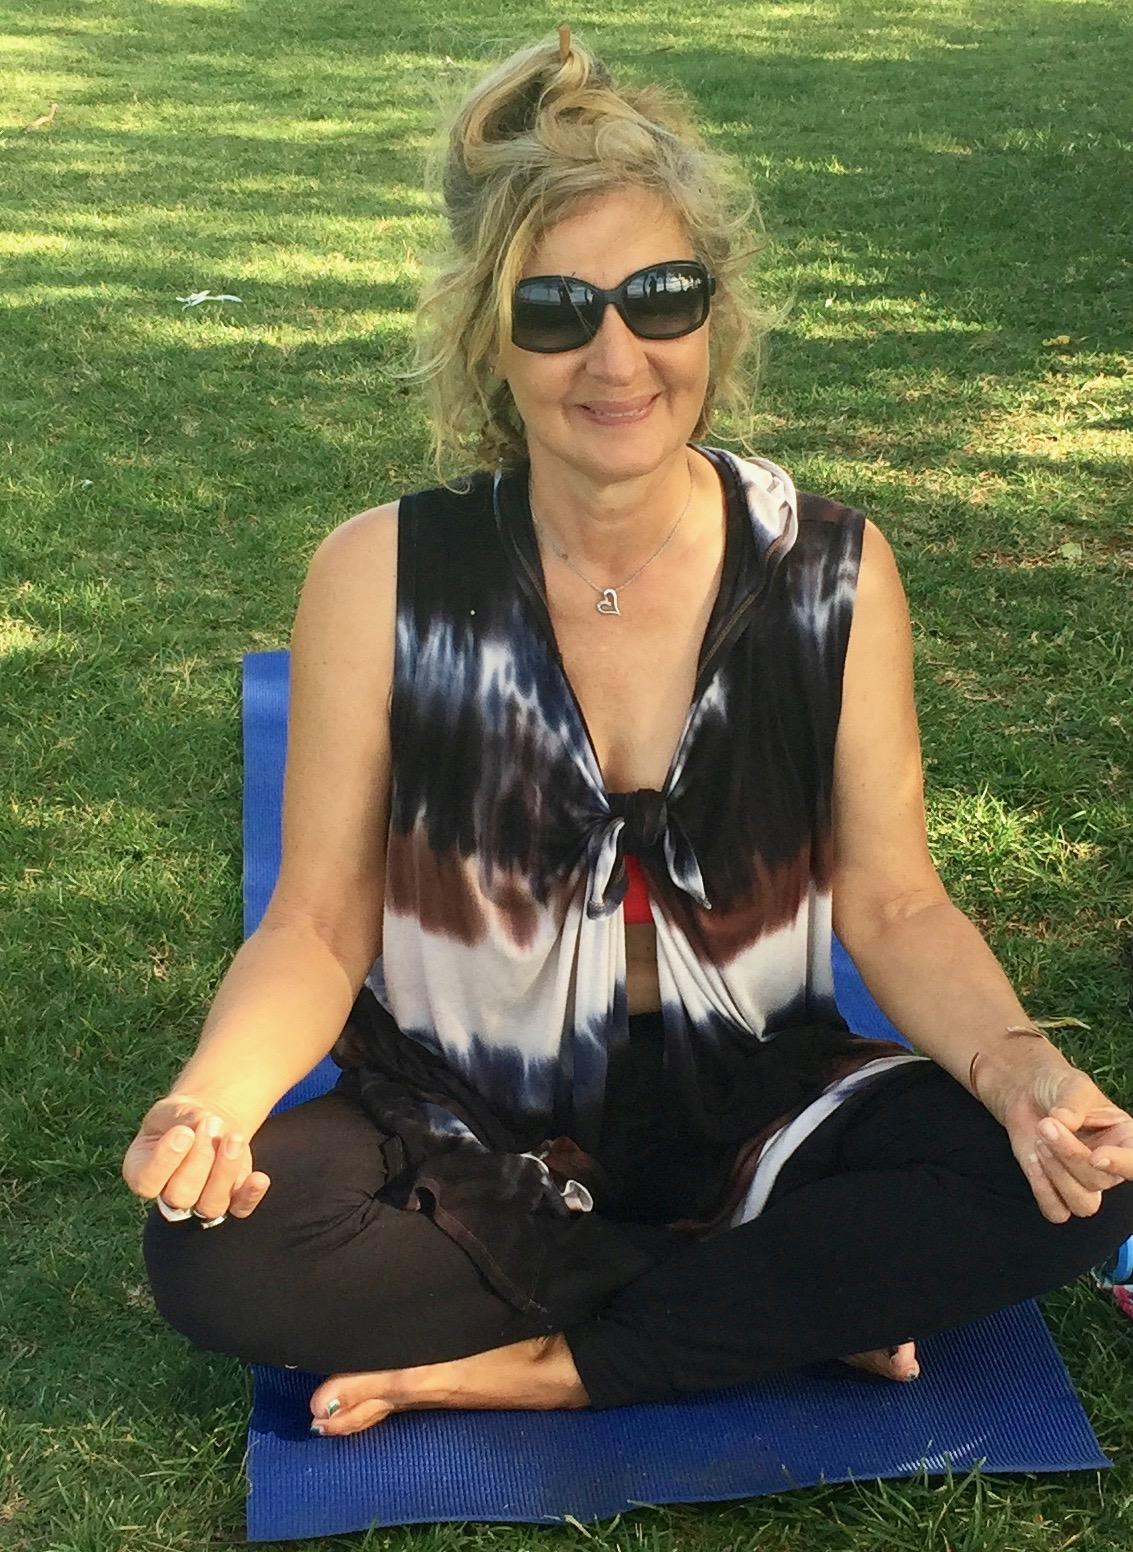 Meditating on lawn - EveKauai.jpg